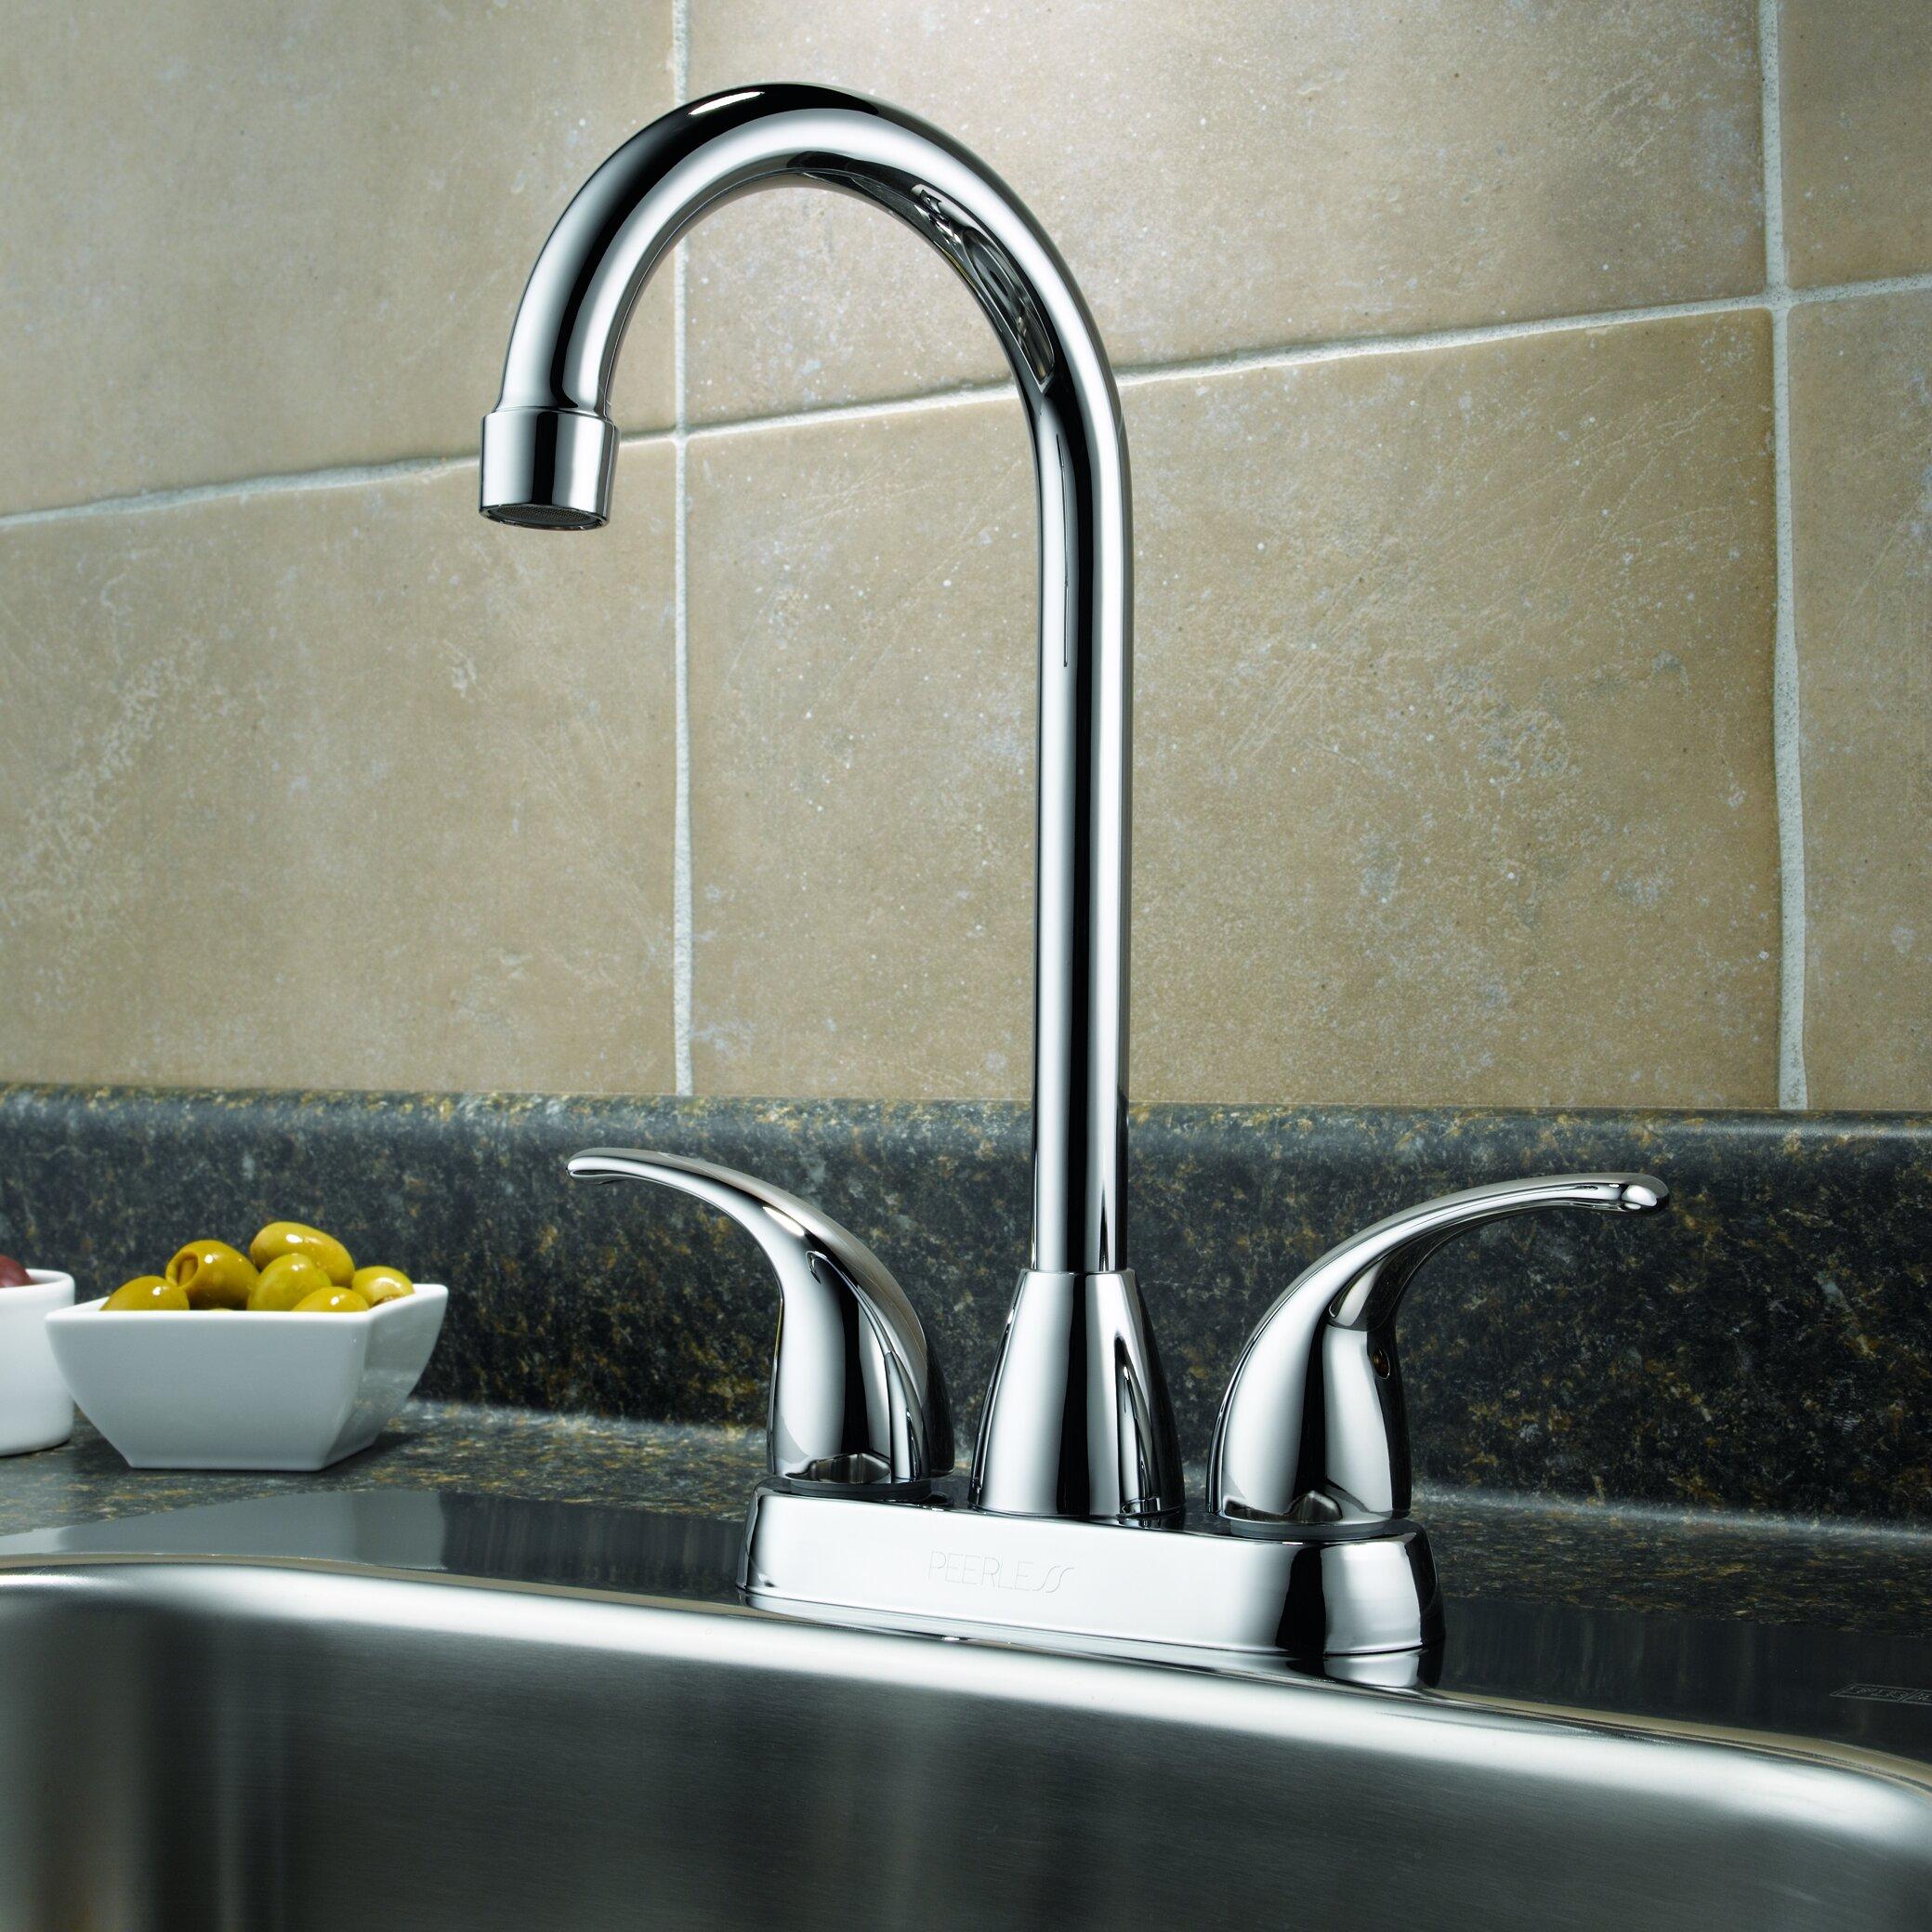 Peerless Faucets Double Handle Kitchen Faucet Reviews